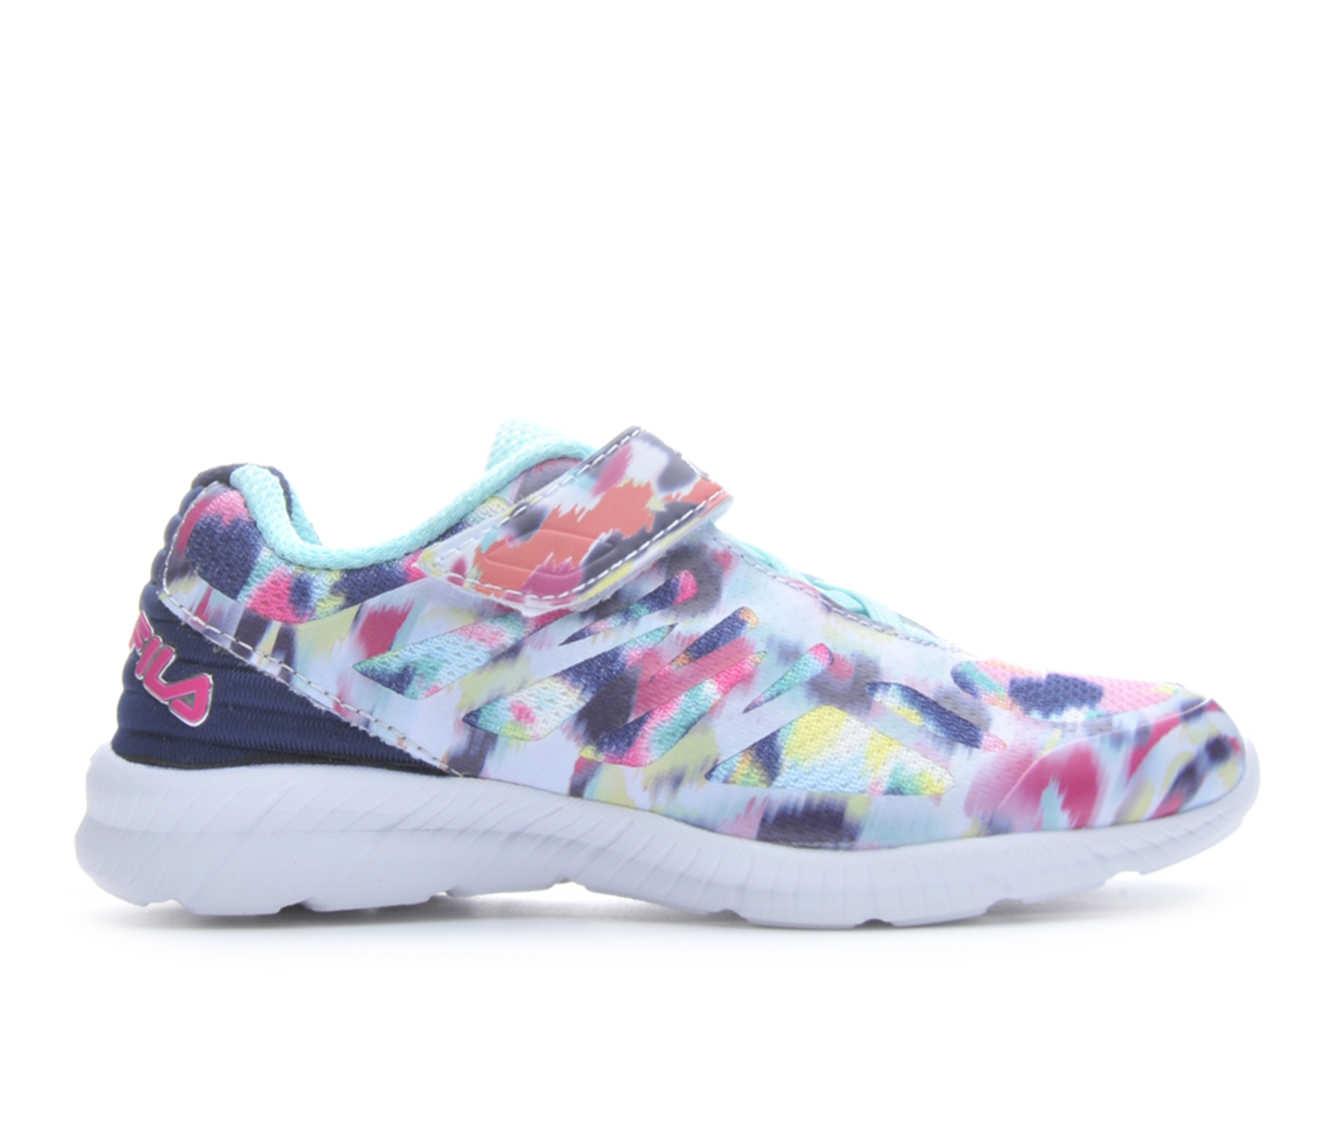 Girls' Fila Speedstride Velcro Running Shoes (Multicolor)